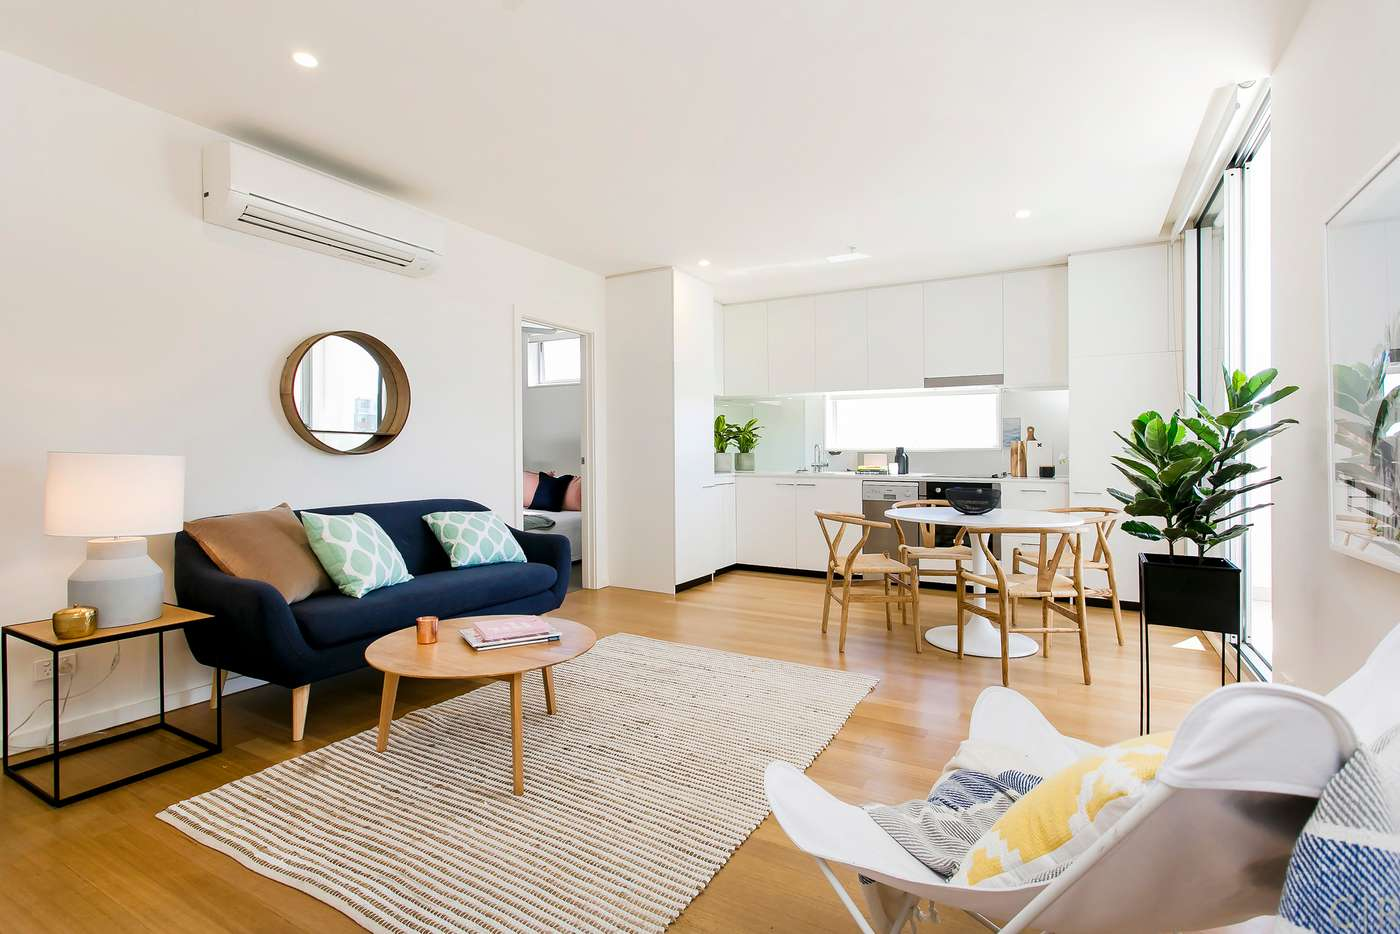 Main view of Homely apartment listing, 404/14 Gilbert Street, Adelaide SA 5000